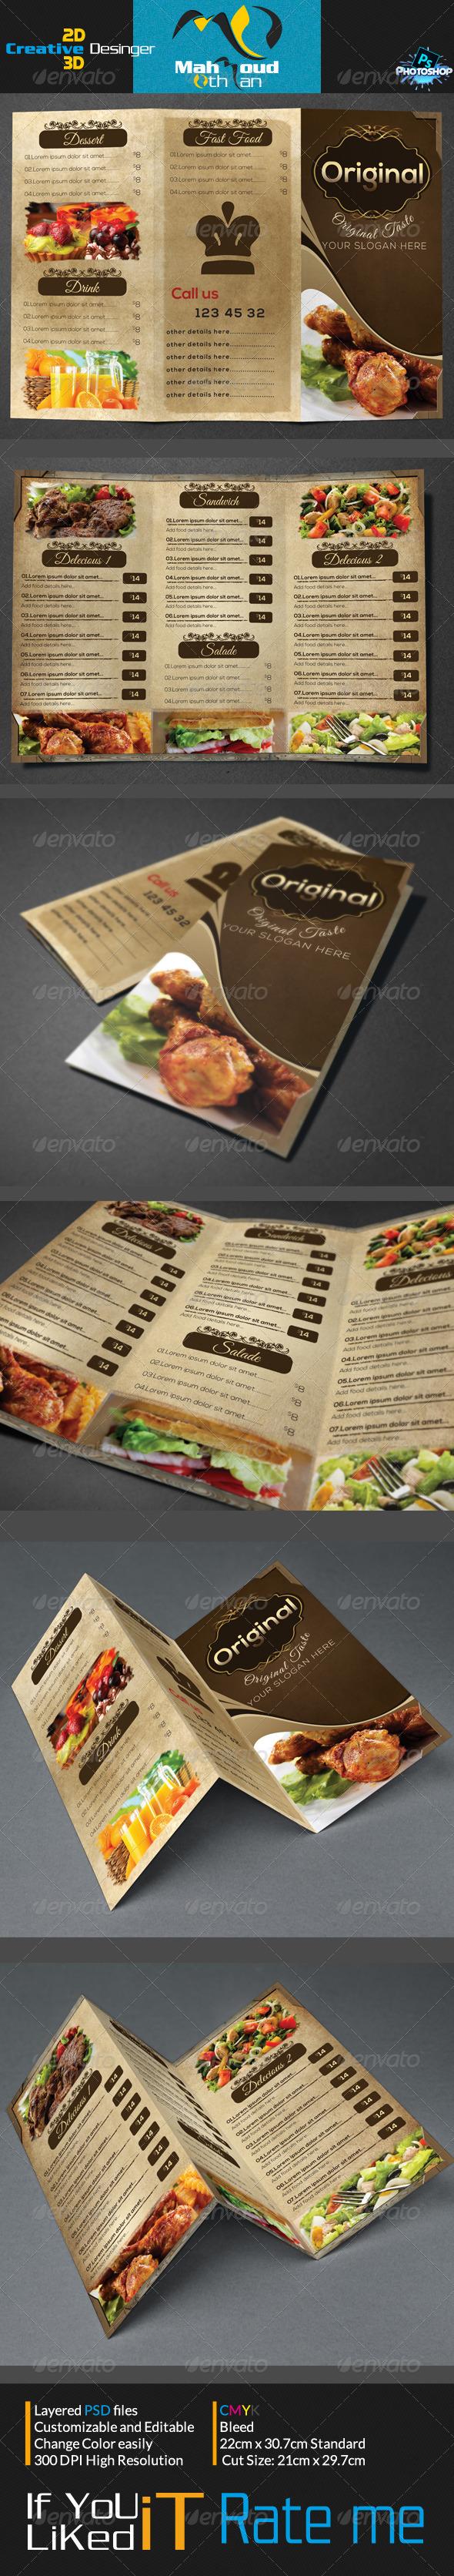 GraphicRiver Vintage Trifold Restaurant Menu 7114322